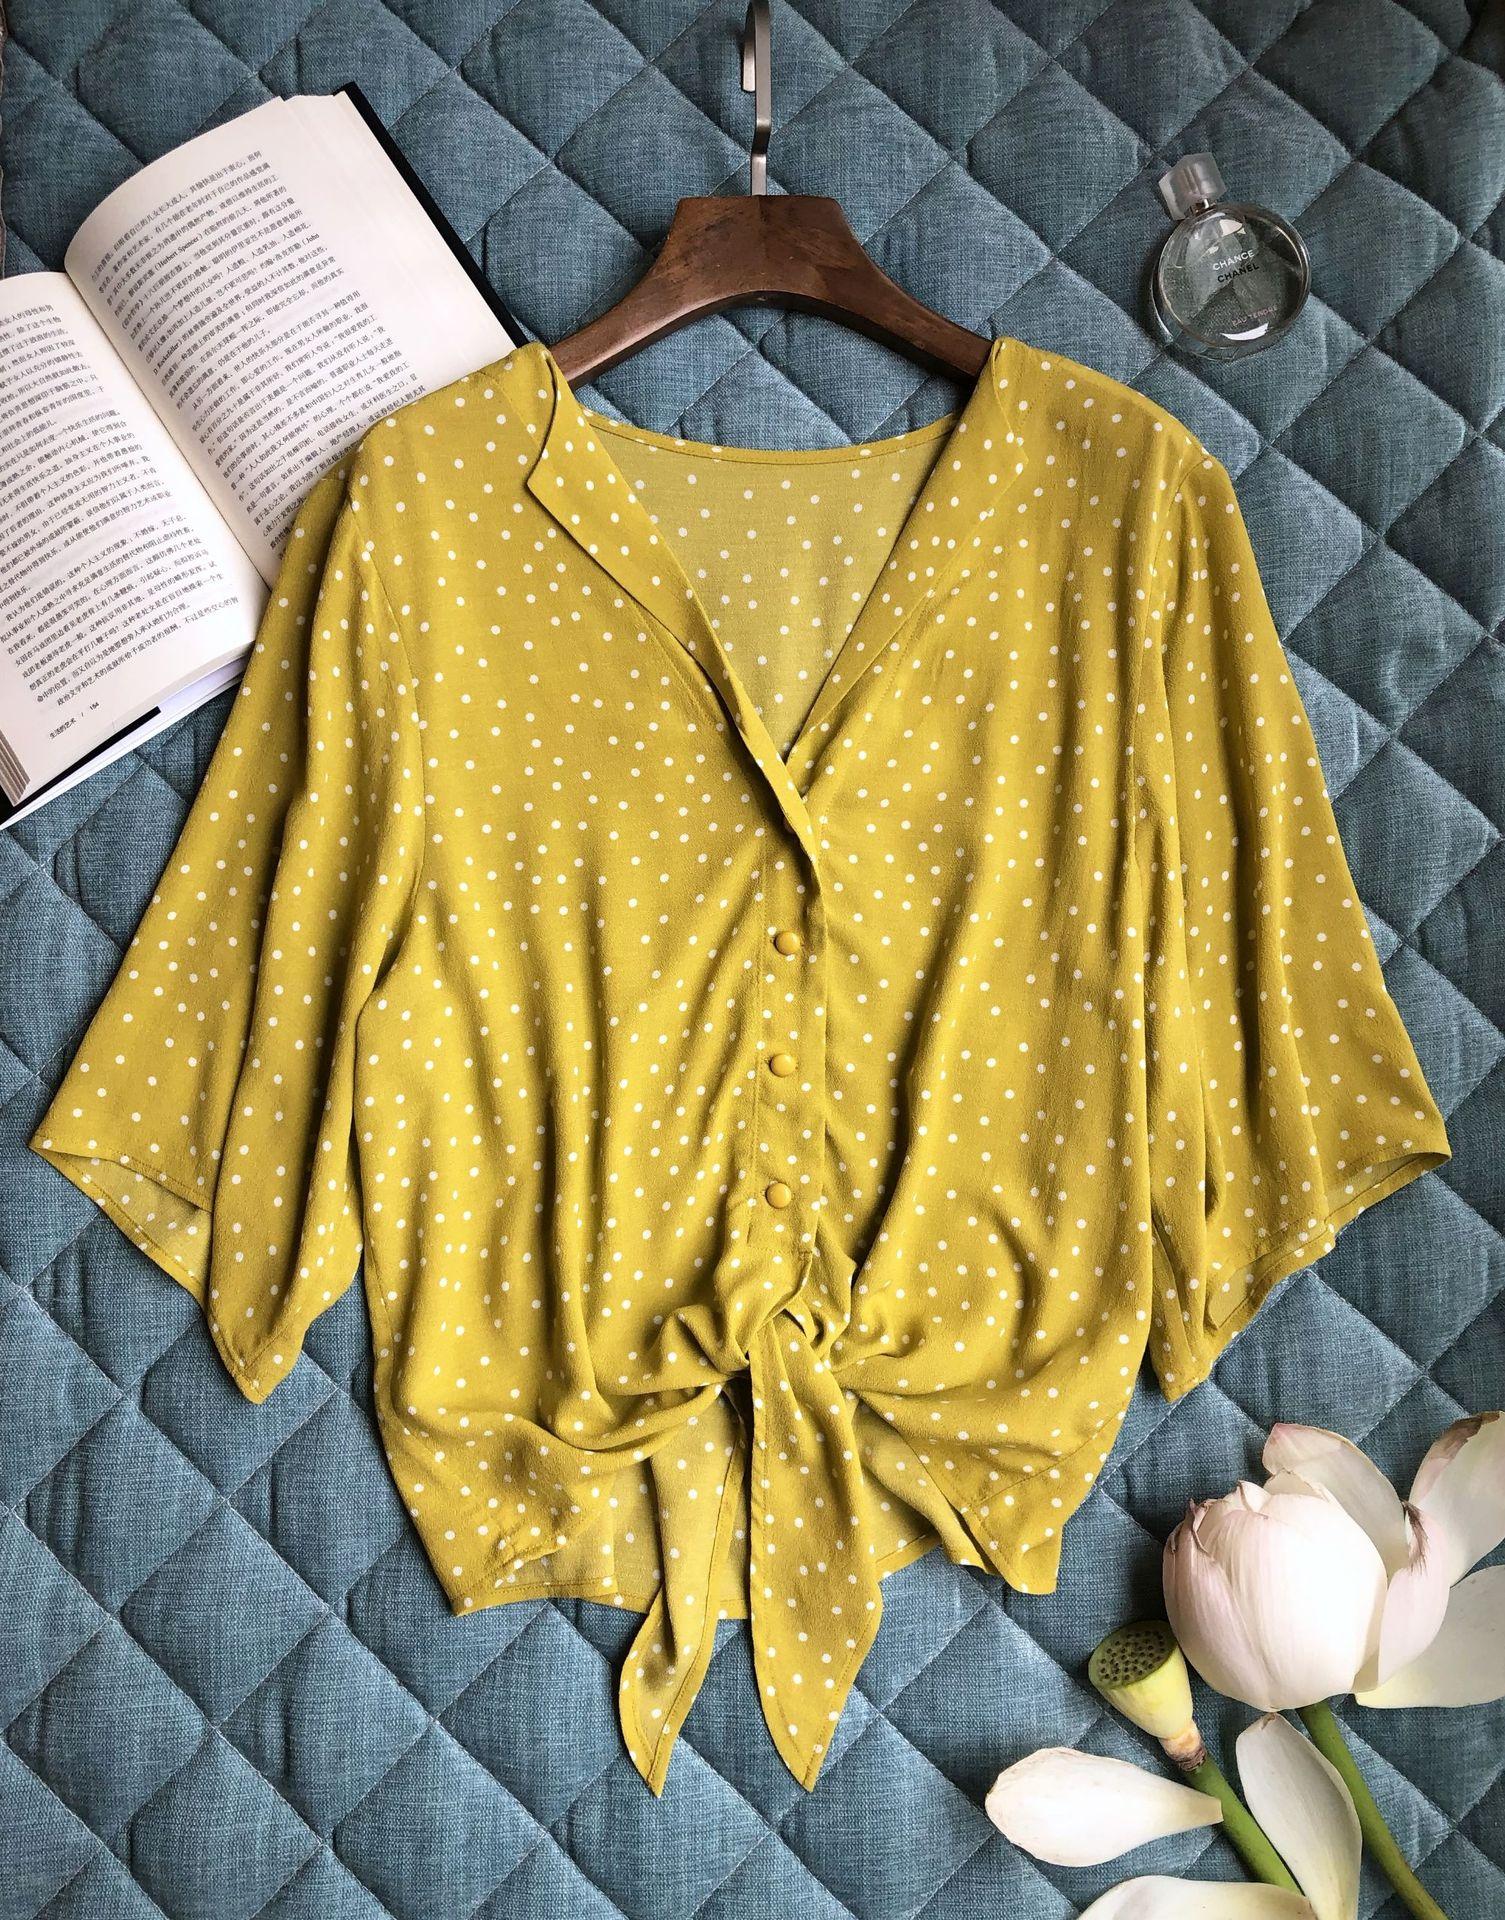 Women Shirt Yellow Dot Tie Shirt 2019 Summer Autumn Fresh Yellow Base White Dot Medium Sleeve